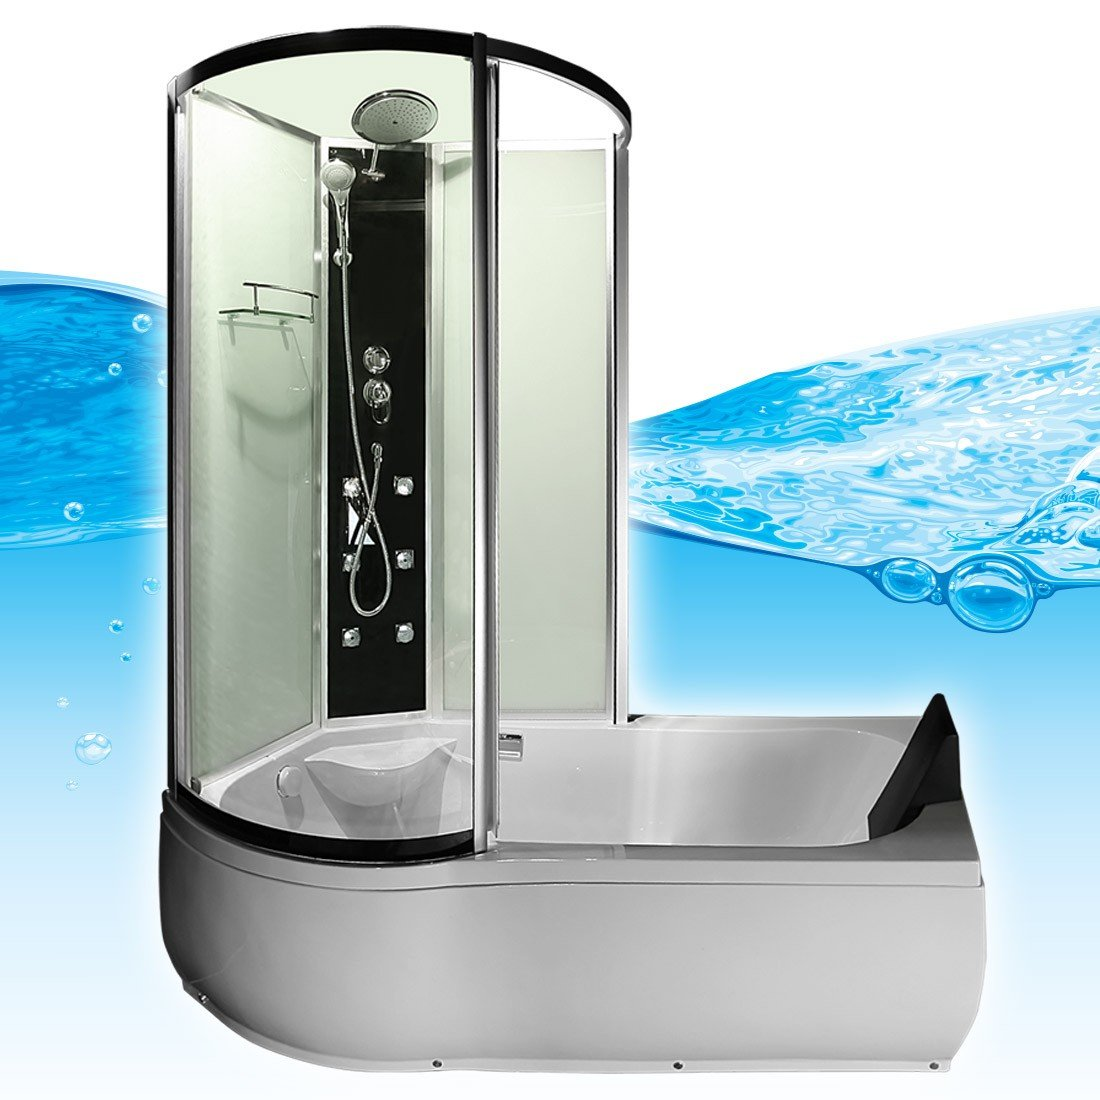 Interessant AcquaVapore DTP8050-A000R Wanne, Badewanne, Dusche, Duschkabine  ST61